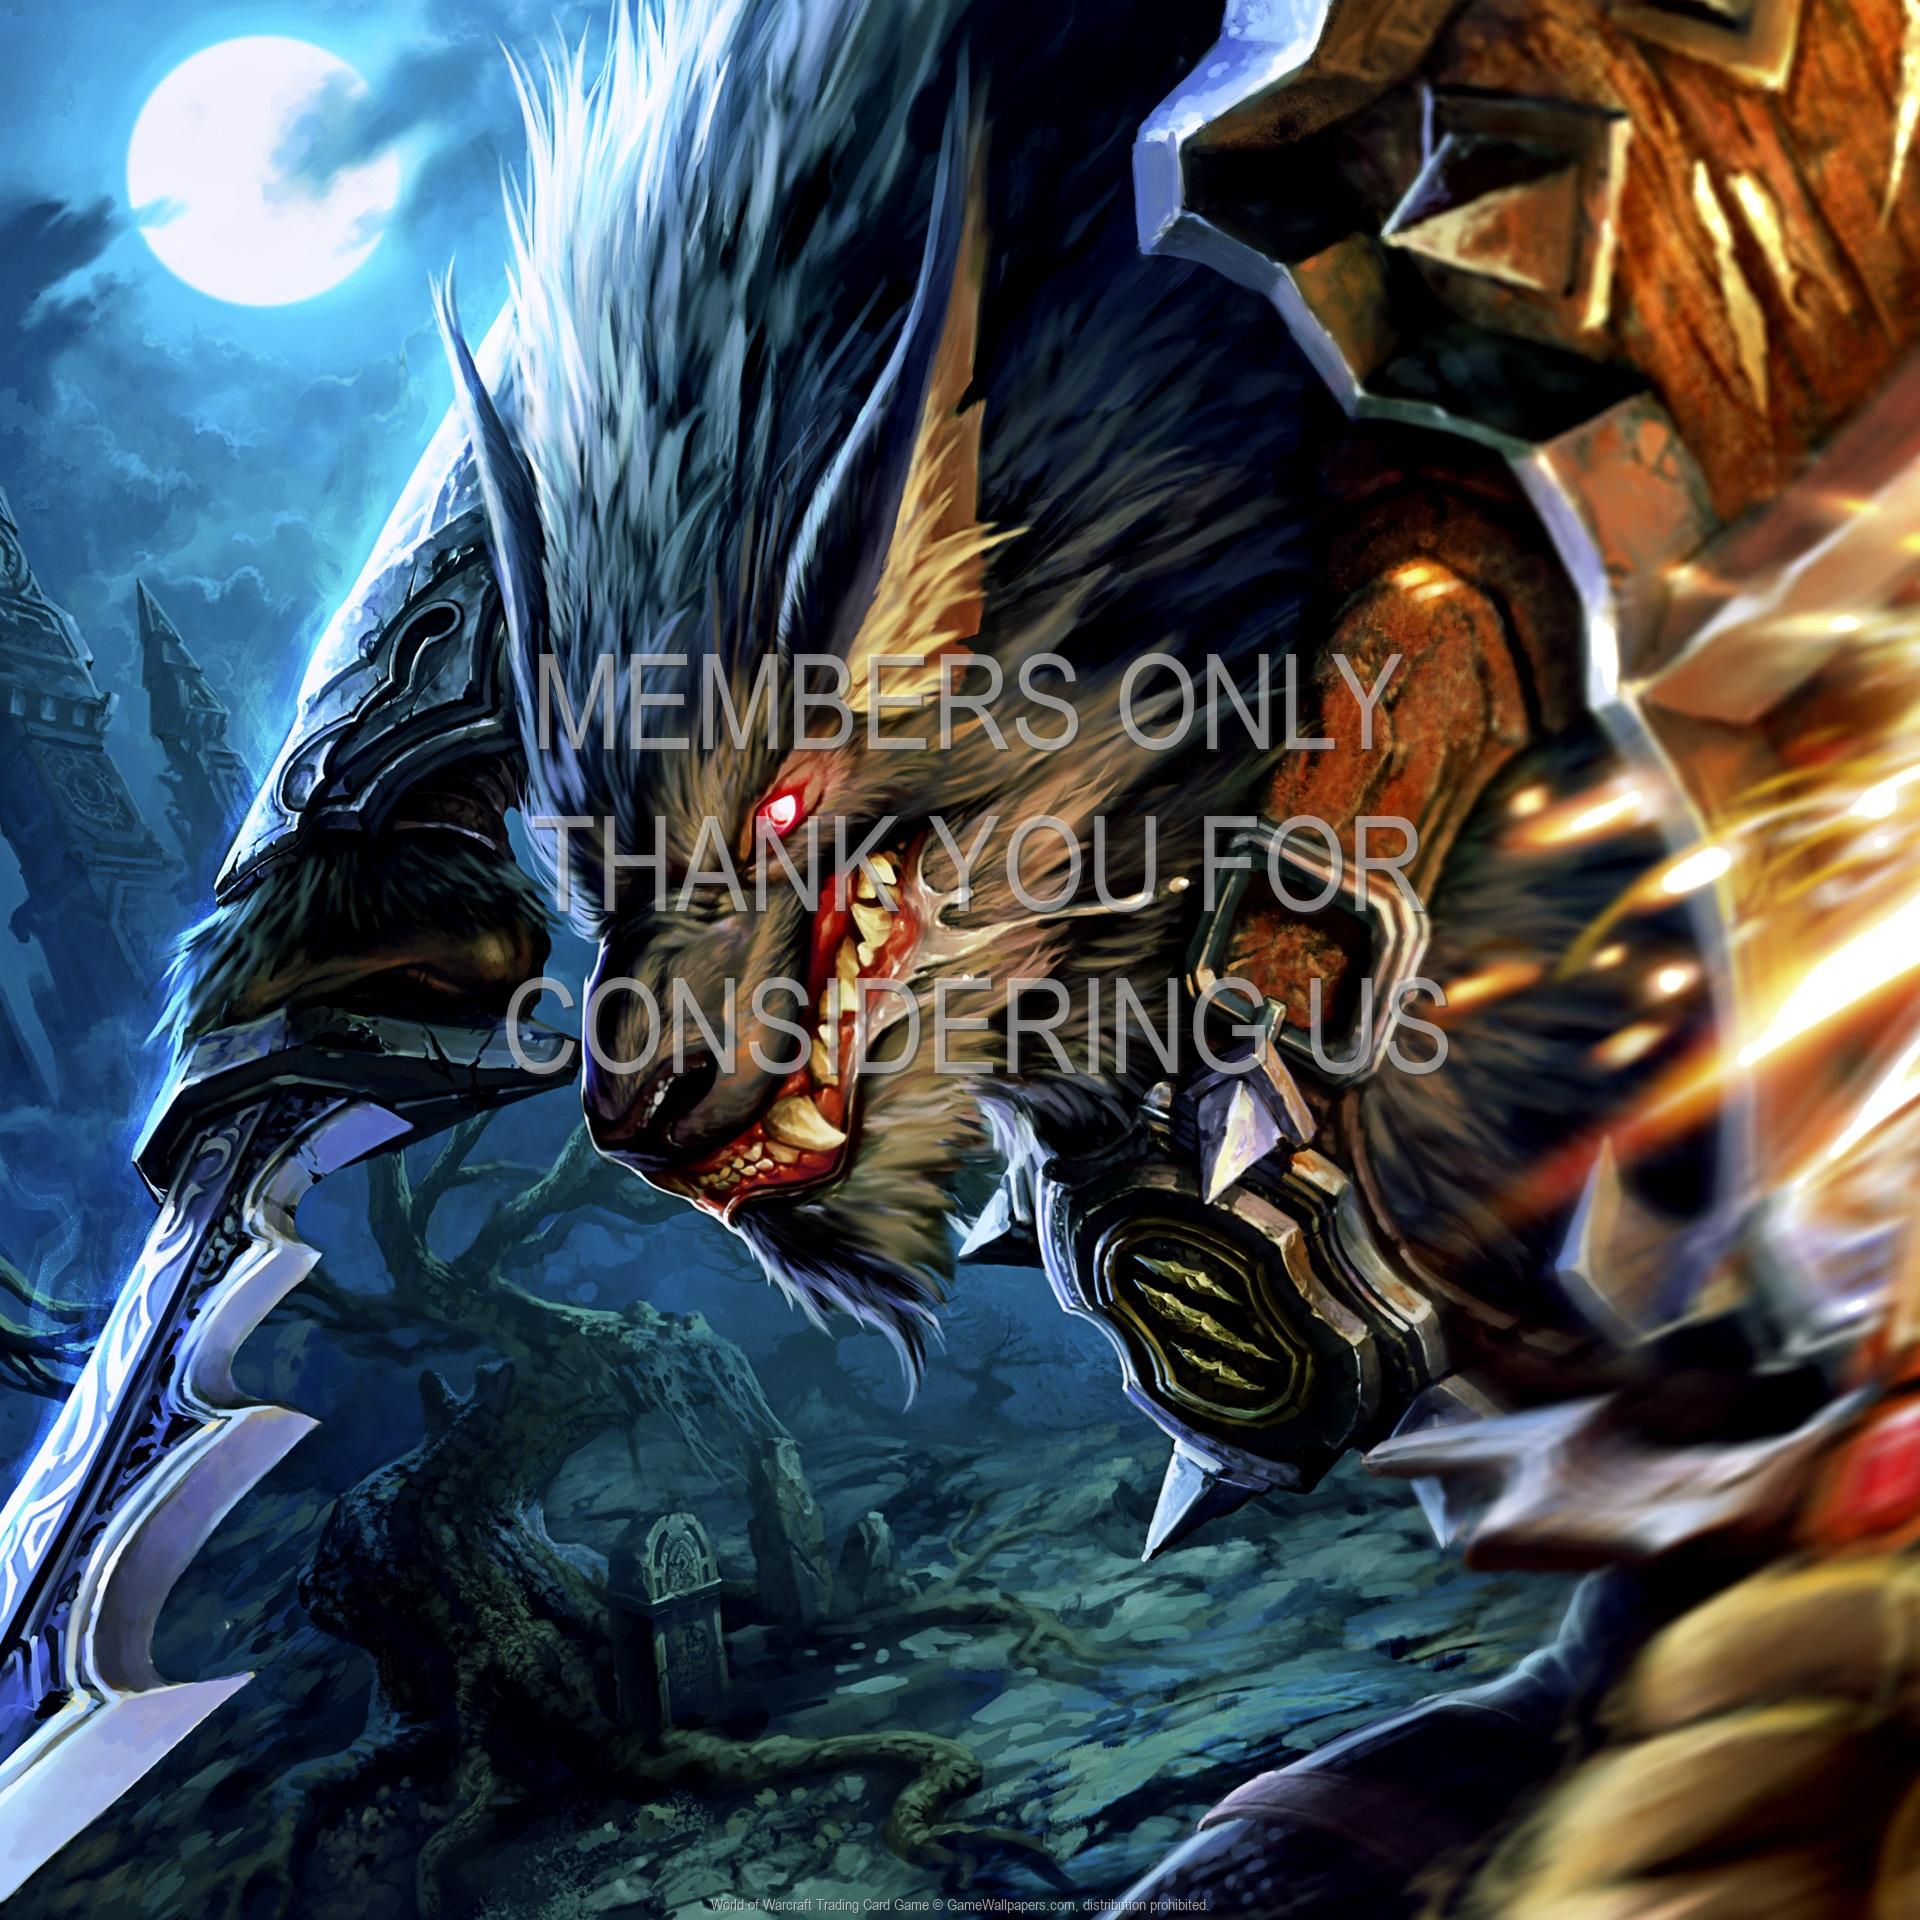 World of Warcraft: Trading Card Game 1920x1080 Handy Hintergrundbild 52